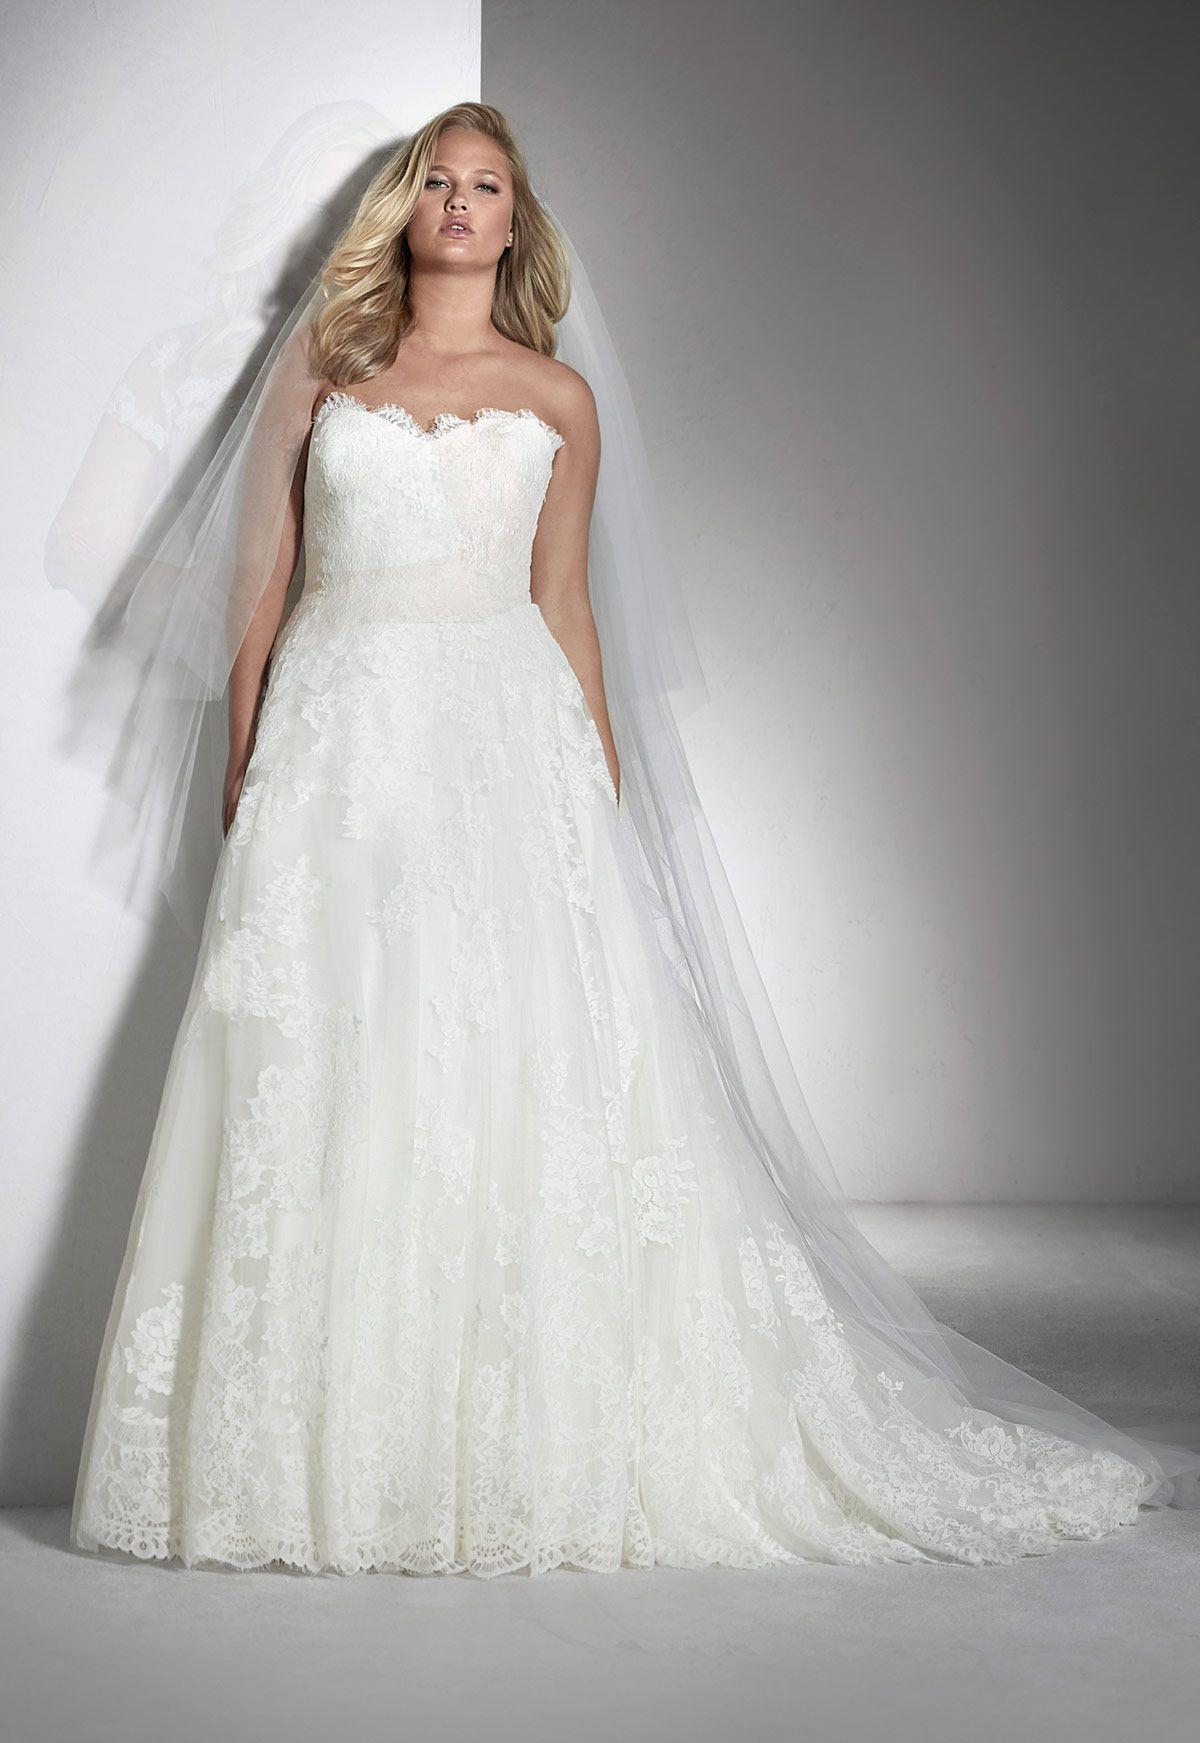 Vestidos novia white one